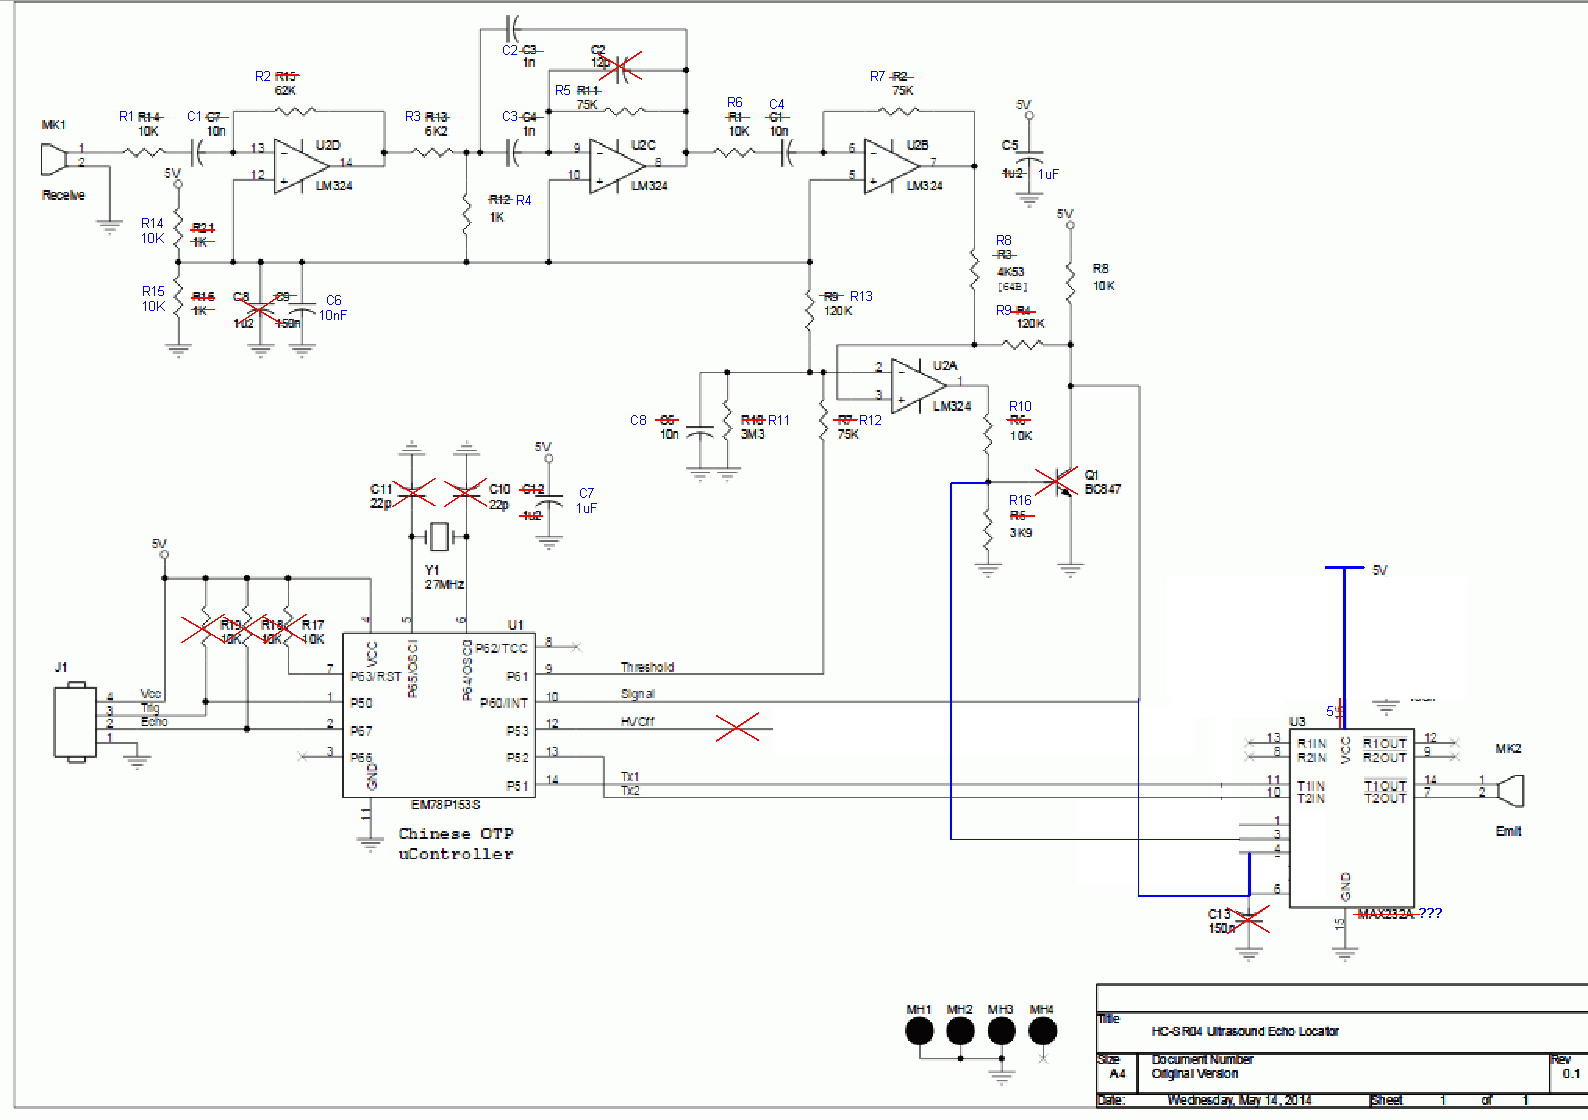 Rotork Electric Actuator Wiring Schematics Diagrams Mov Hc Sr04 Circuit Diagram And Iqfm Manual Ball Valve